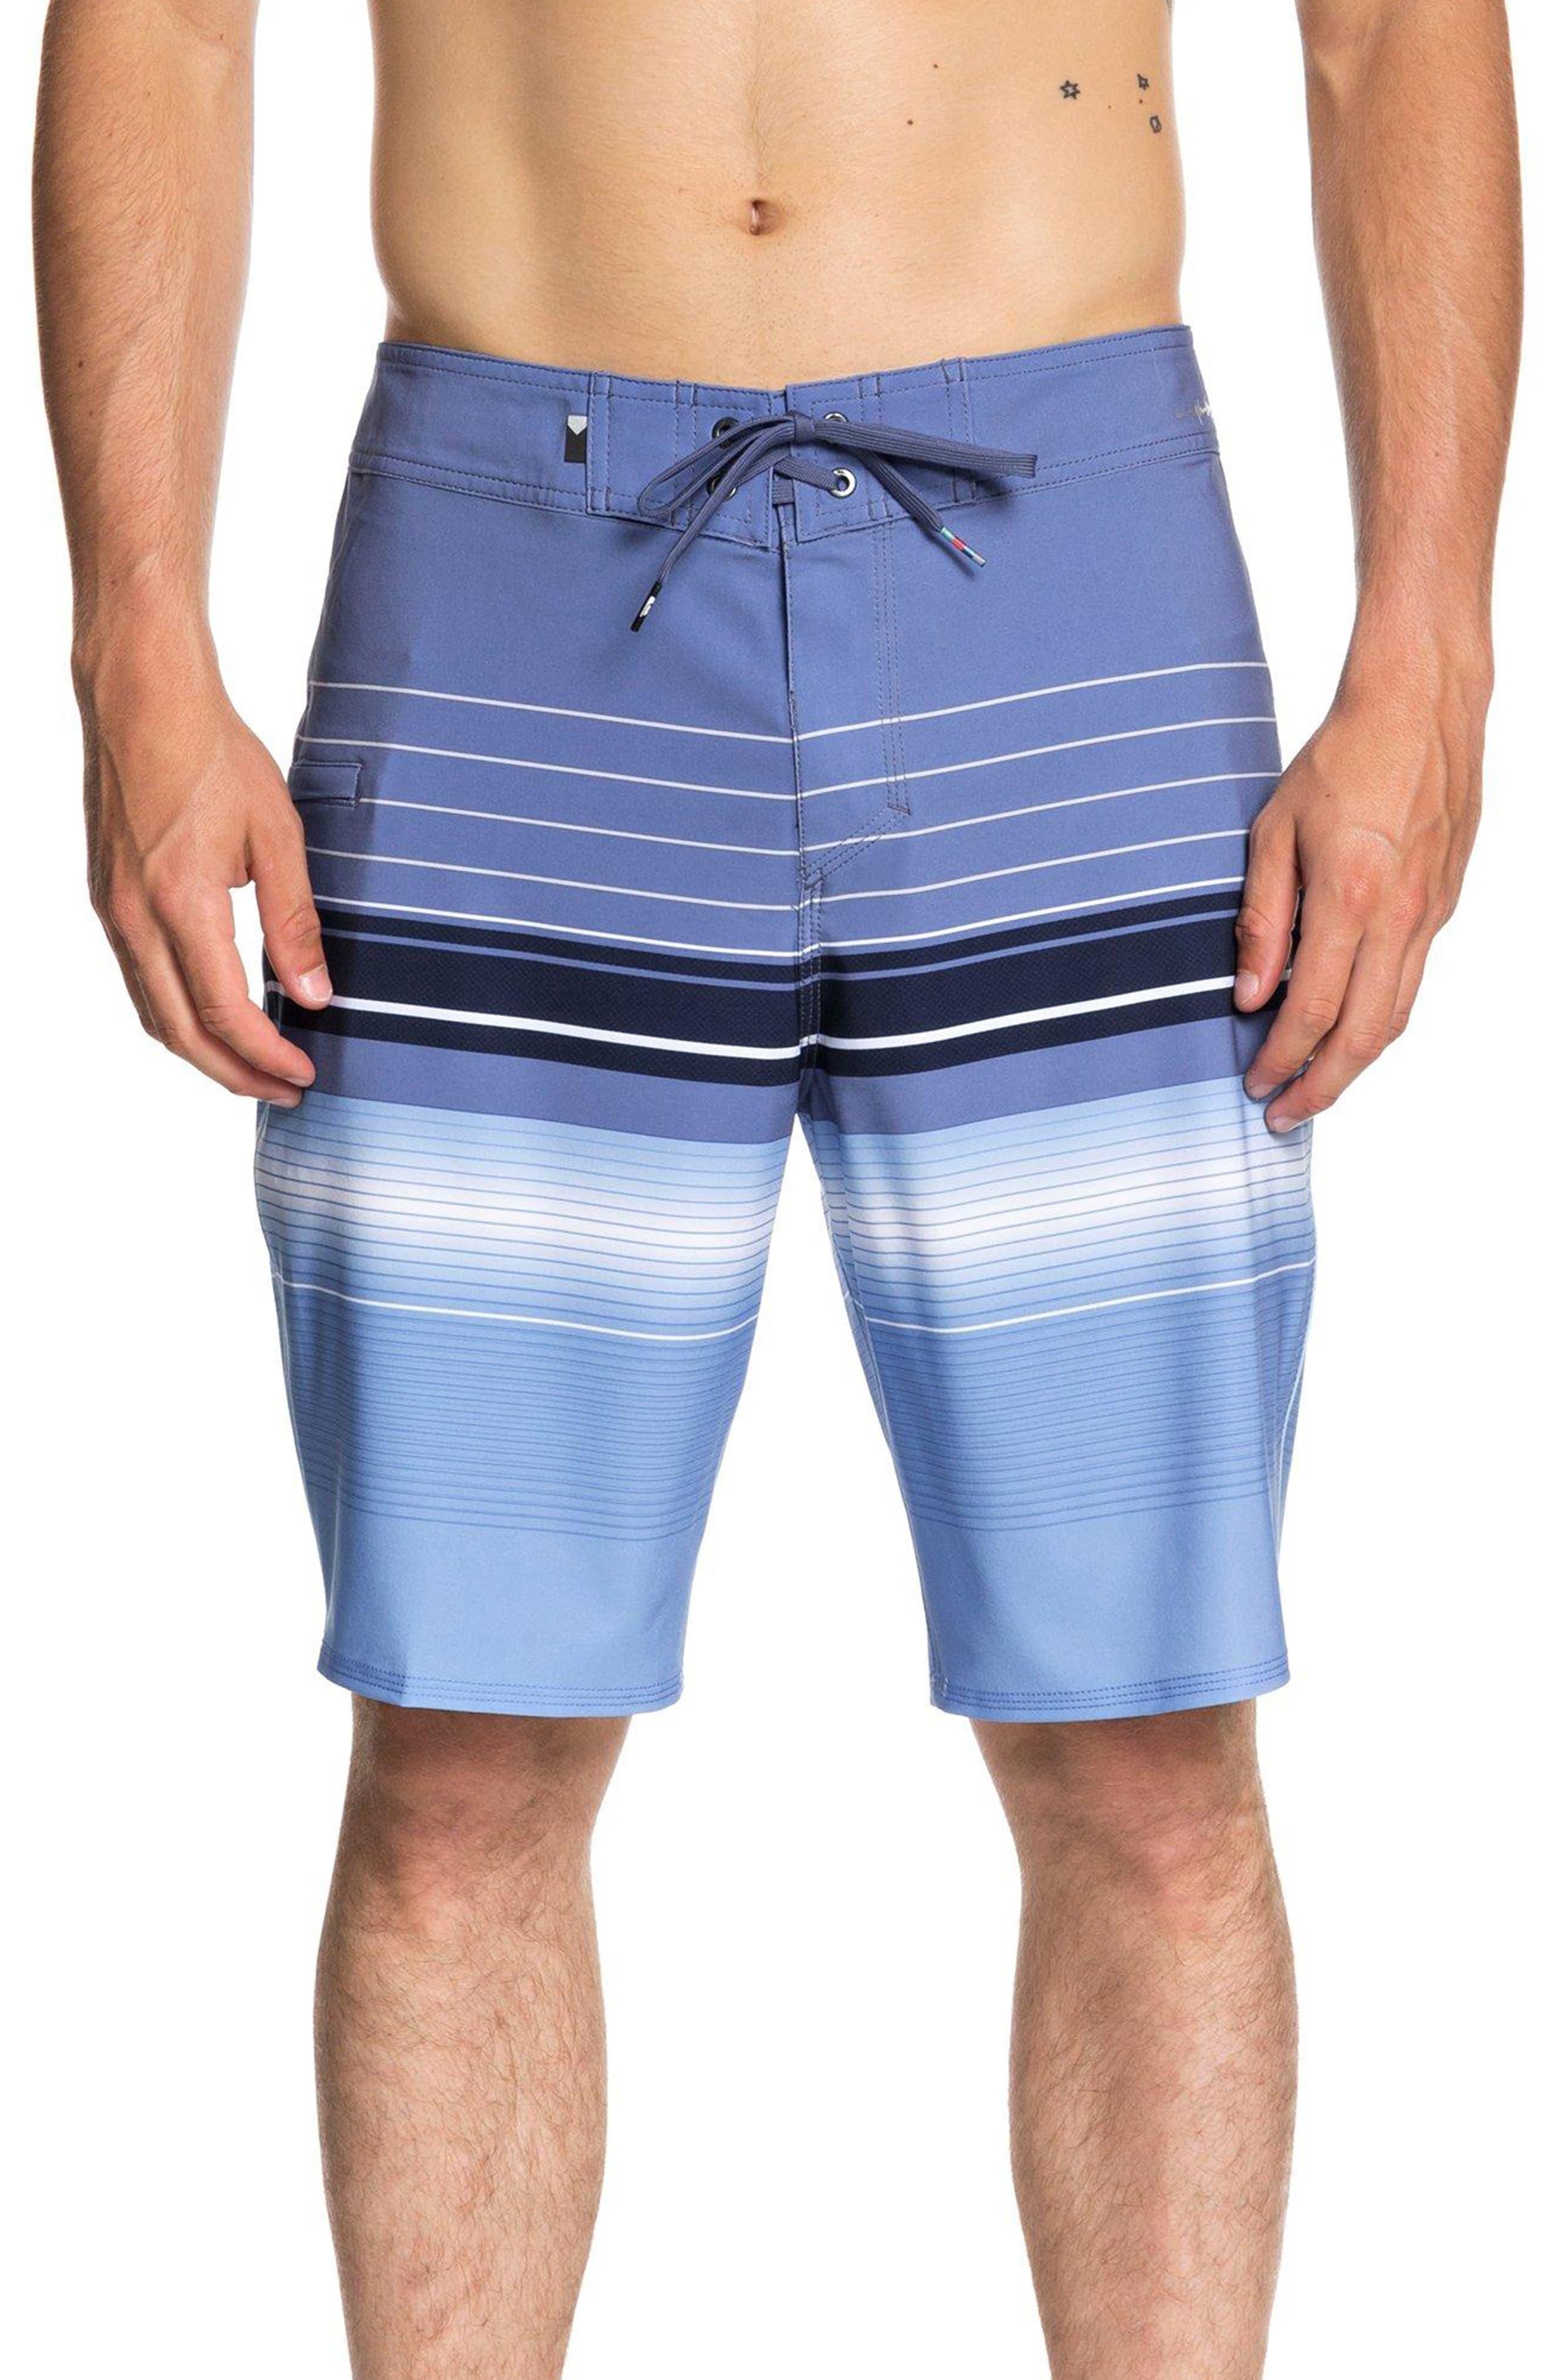 Highline Swell Vision Board Shorts,                             Main thumbnail 1, color,                             BIJOU BLUE